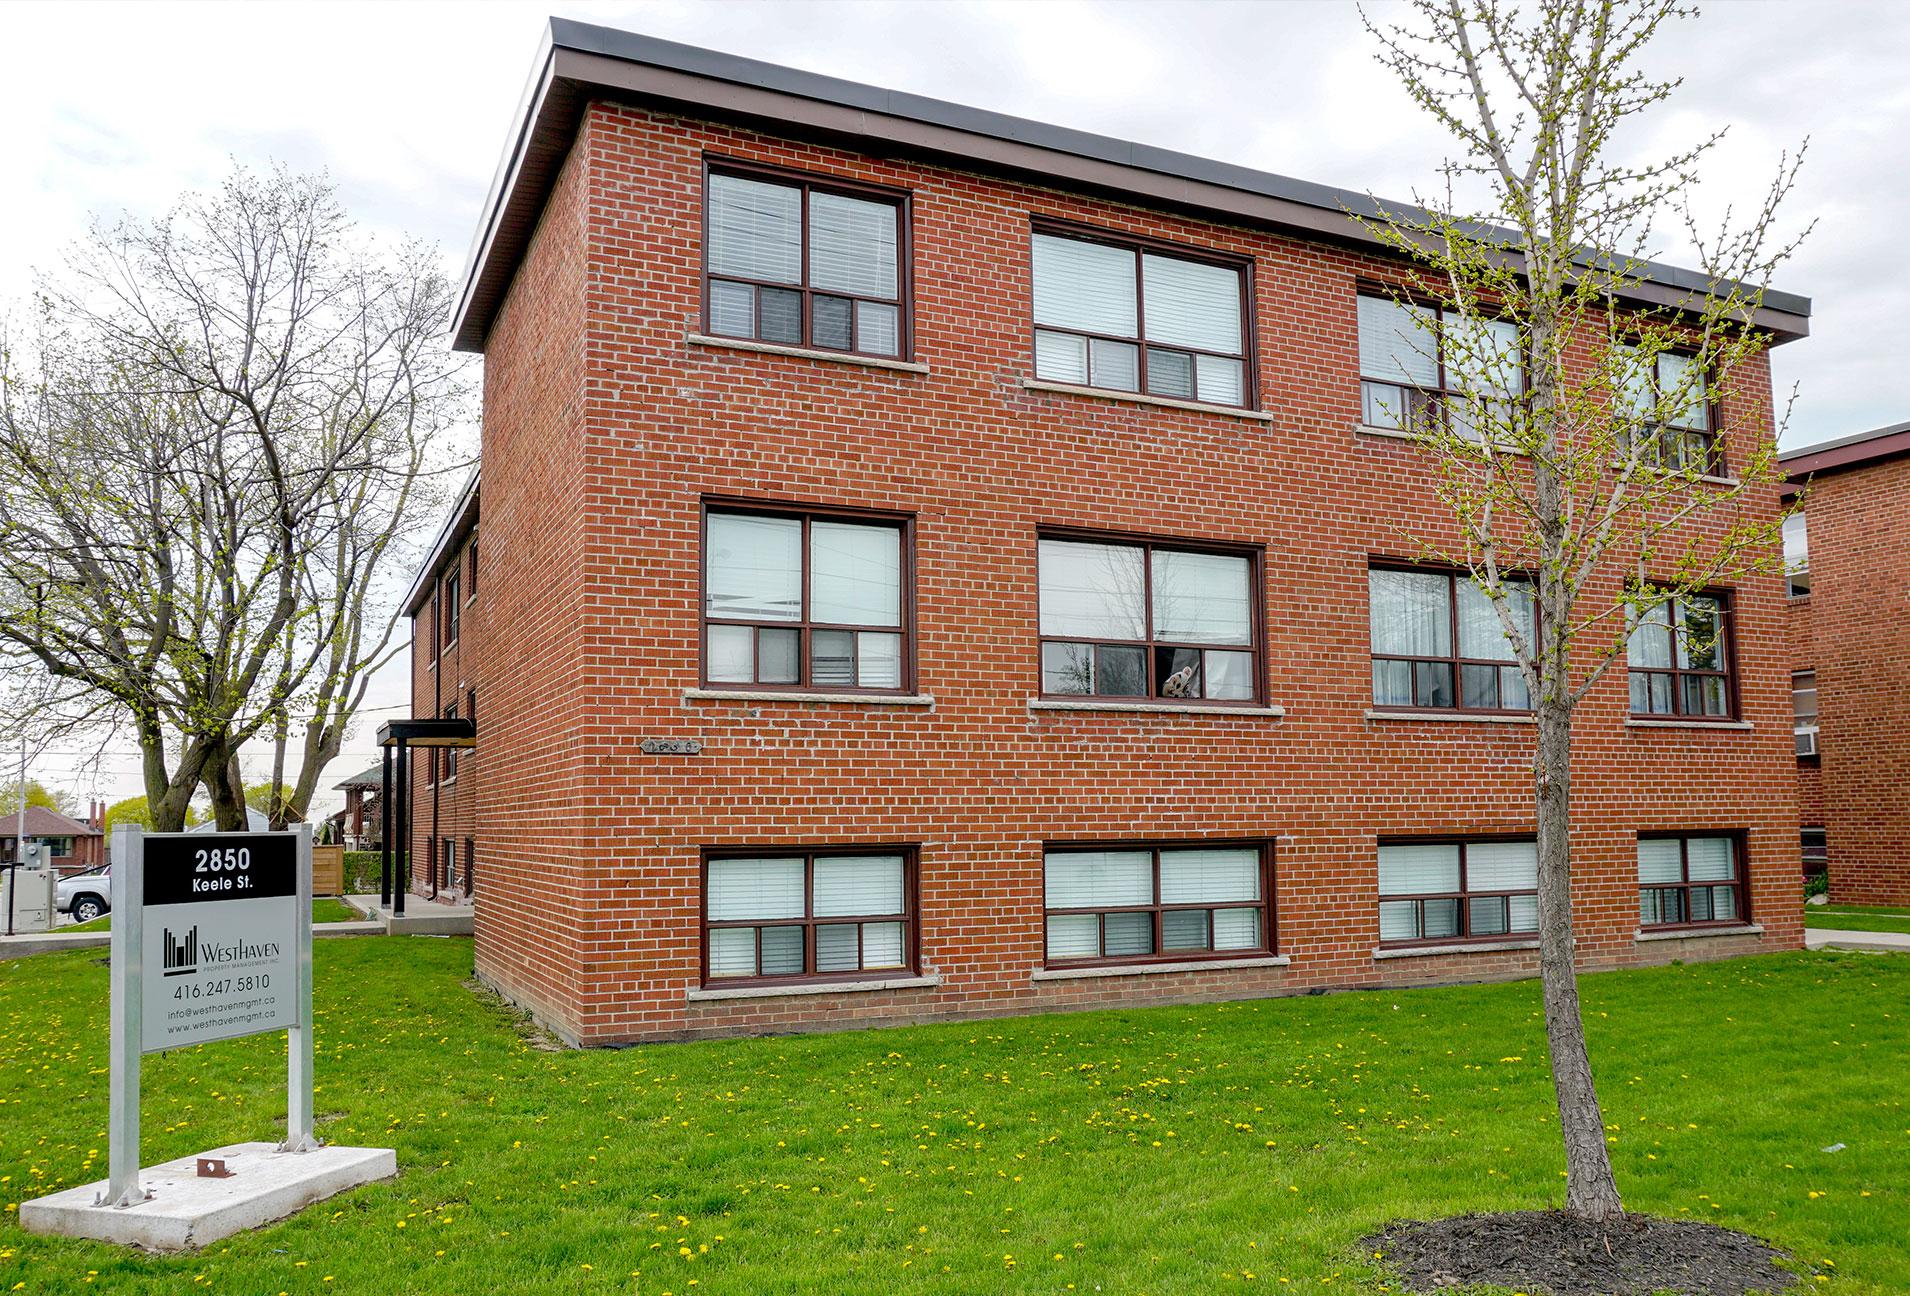 toronto-property-management-2850-keele-street.jpg